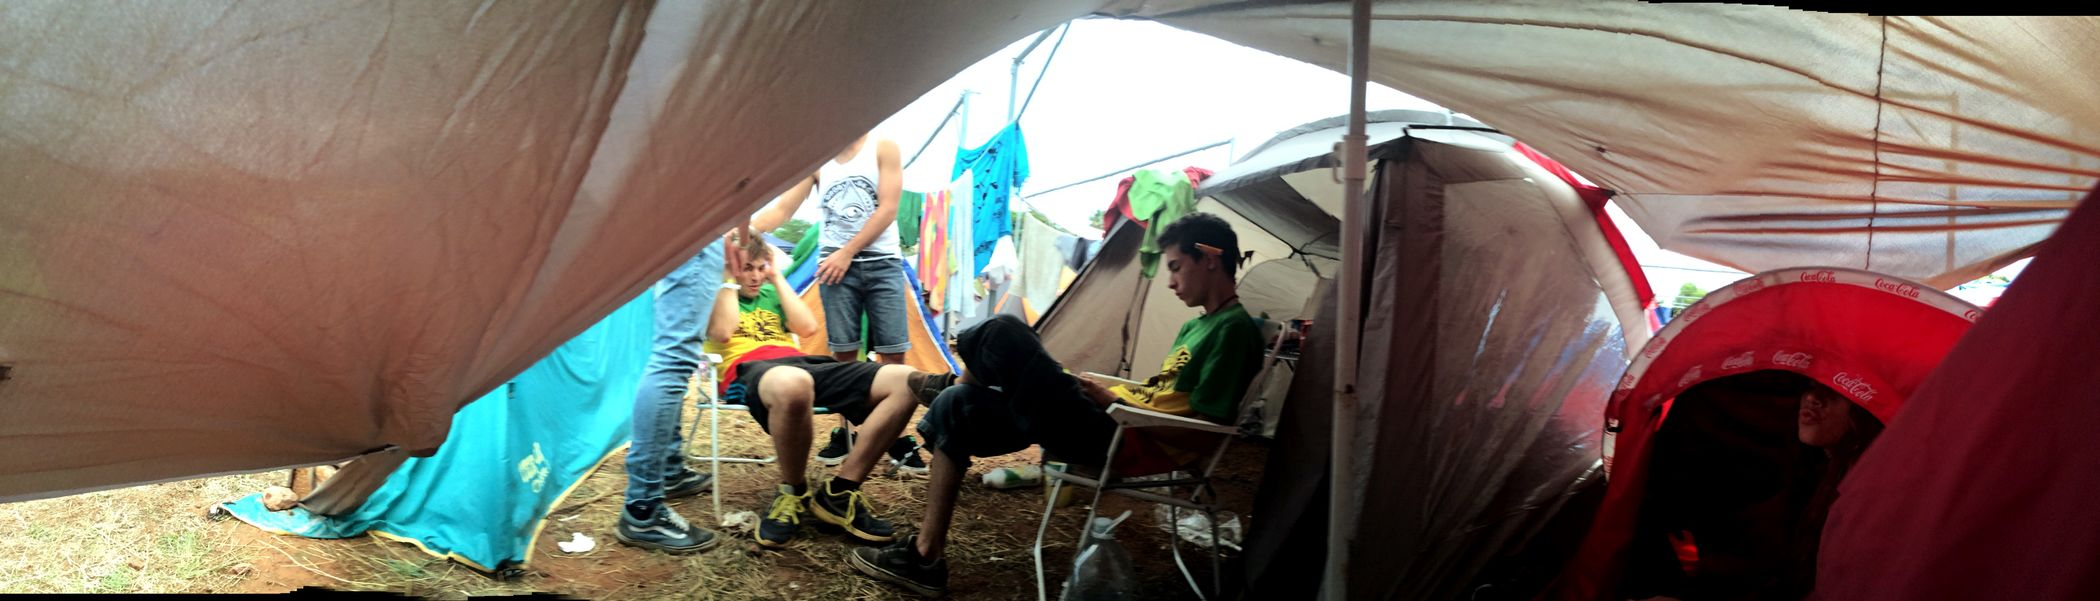 Enjoying Life Camping Hello World Love RASTA Weed Rototomsunsplash Urban Lifestyle